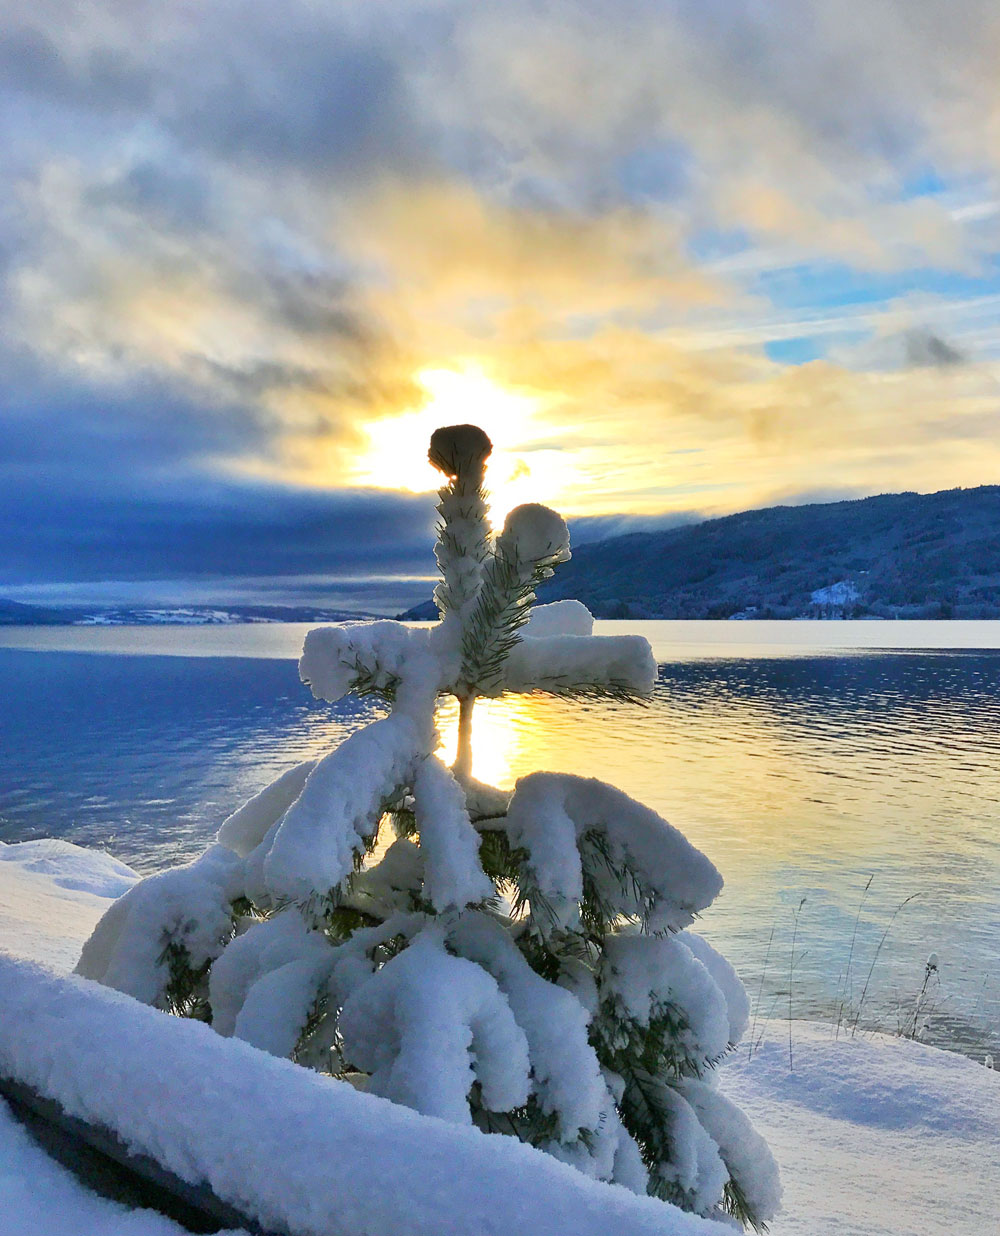 Valdres-Etnedalen-Norge